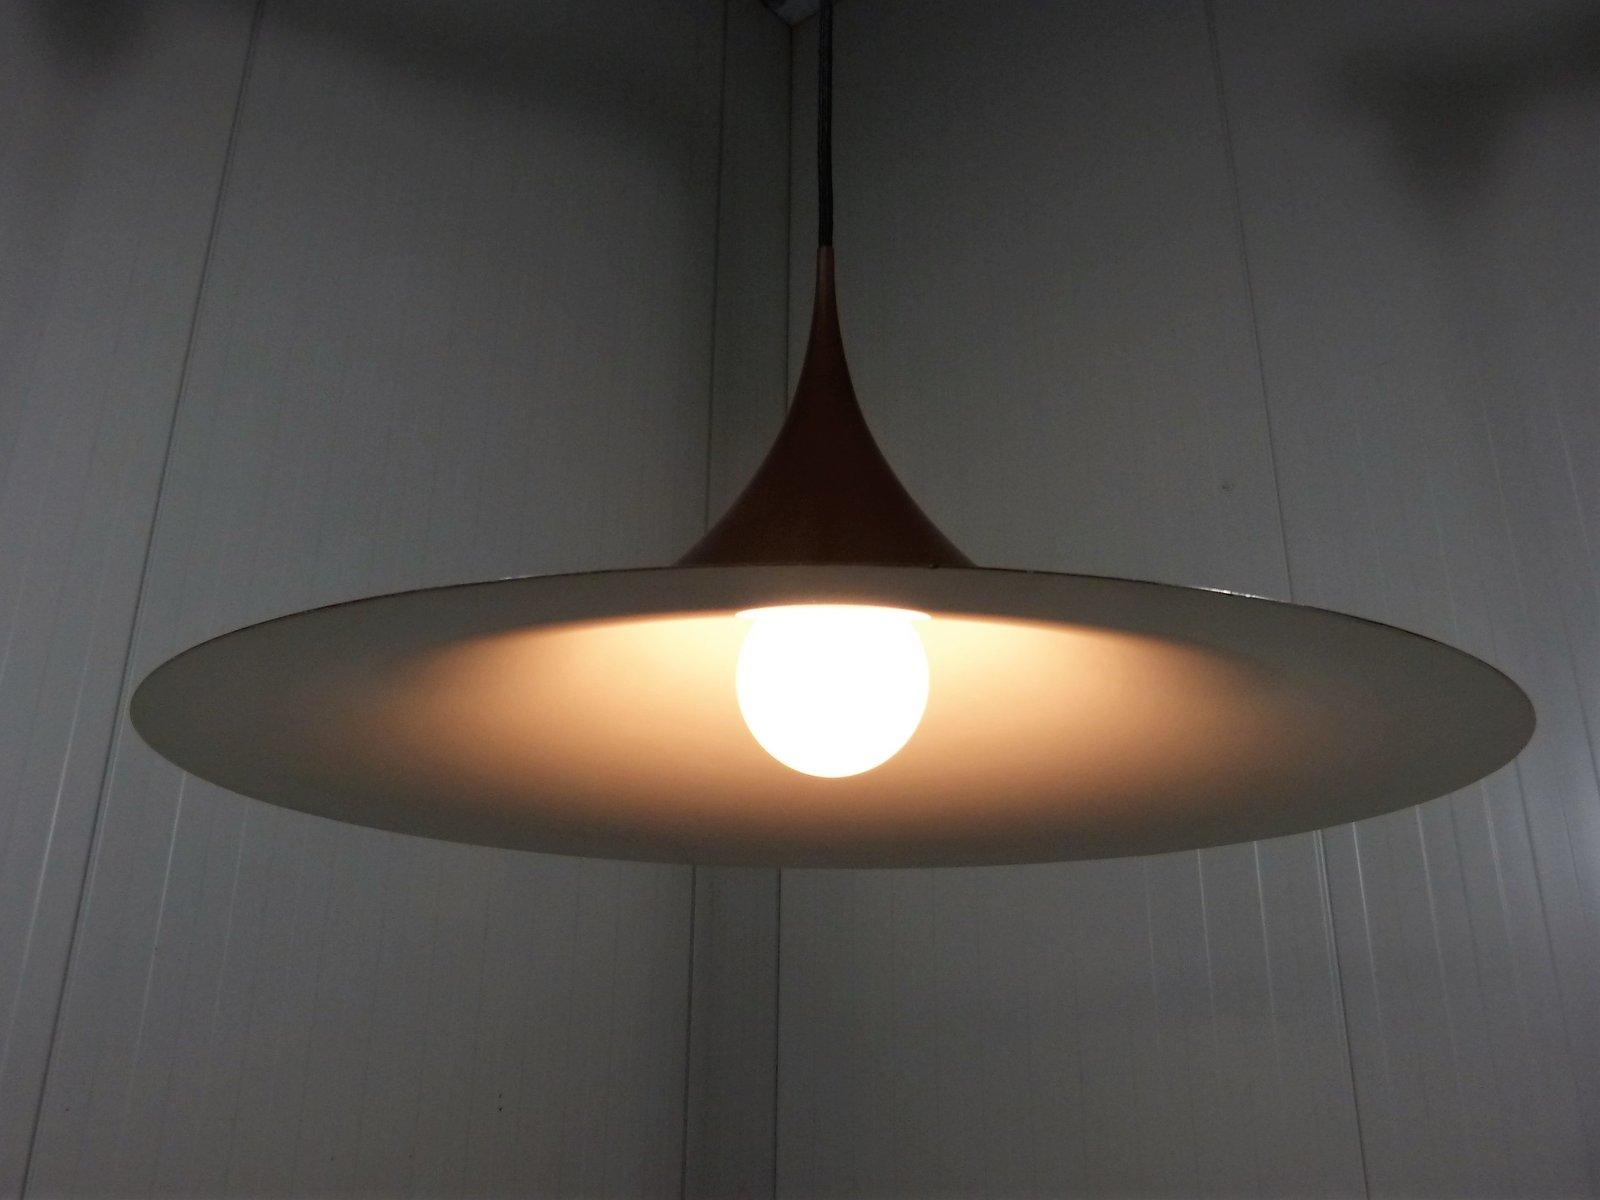 Lampade Da Soffitto Di Design : Lampada da soffitto di claus bonderup torsten thorup per fog